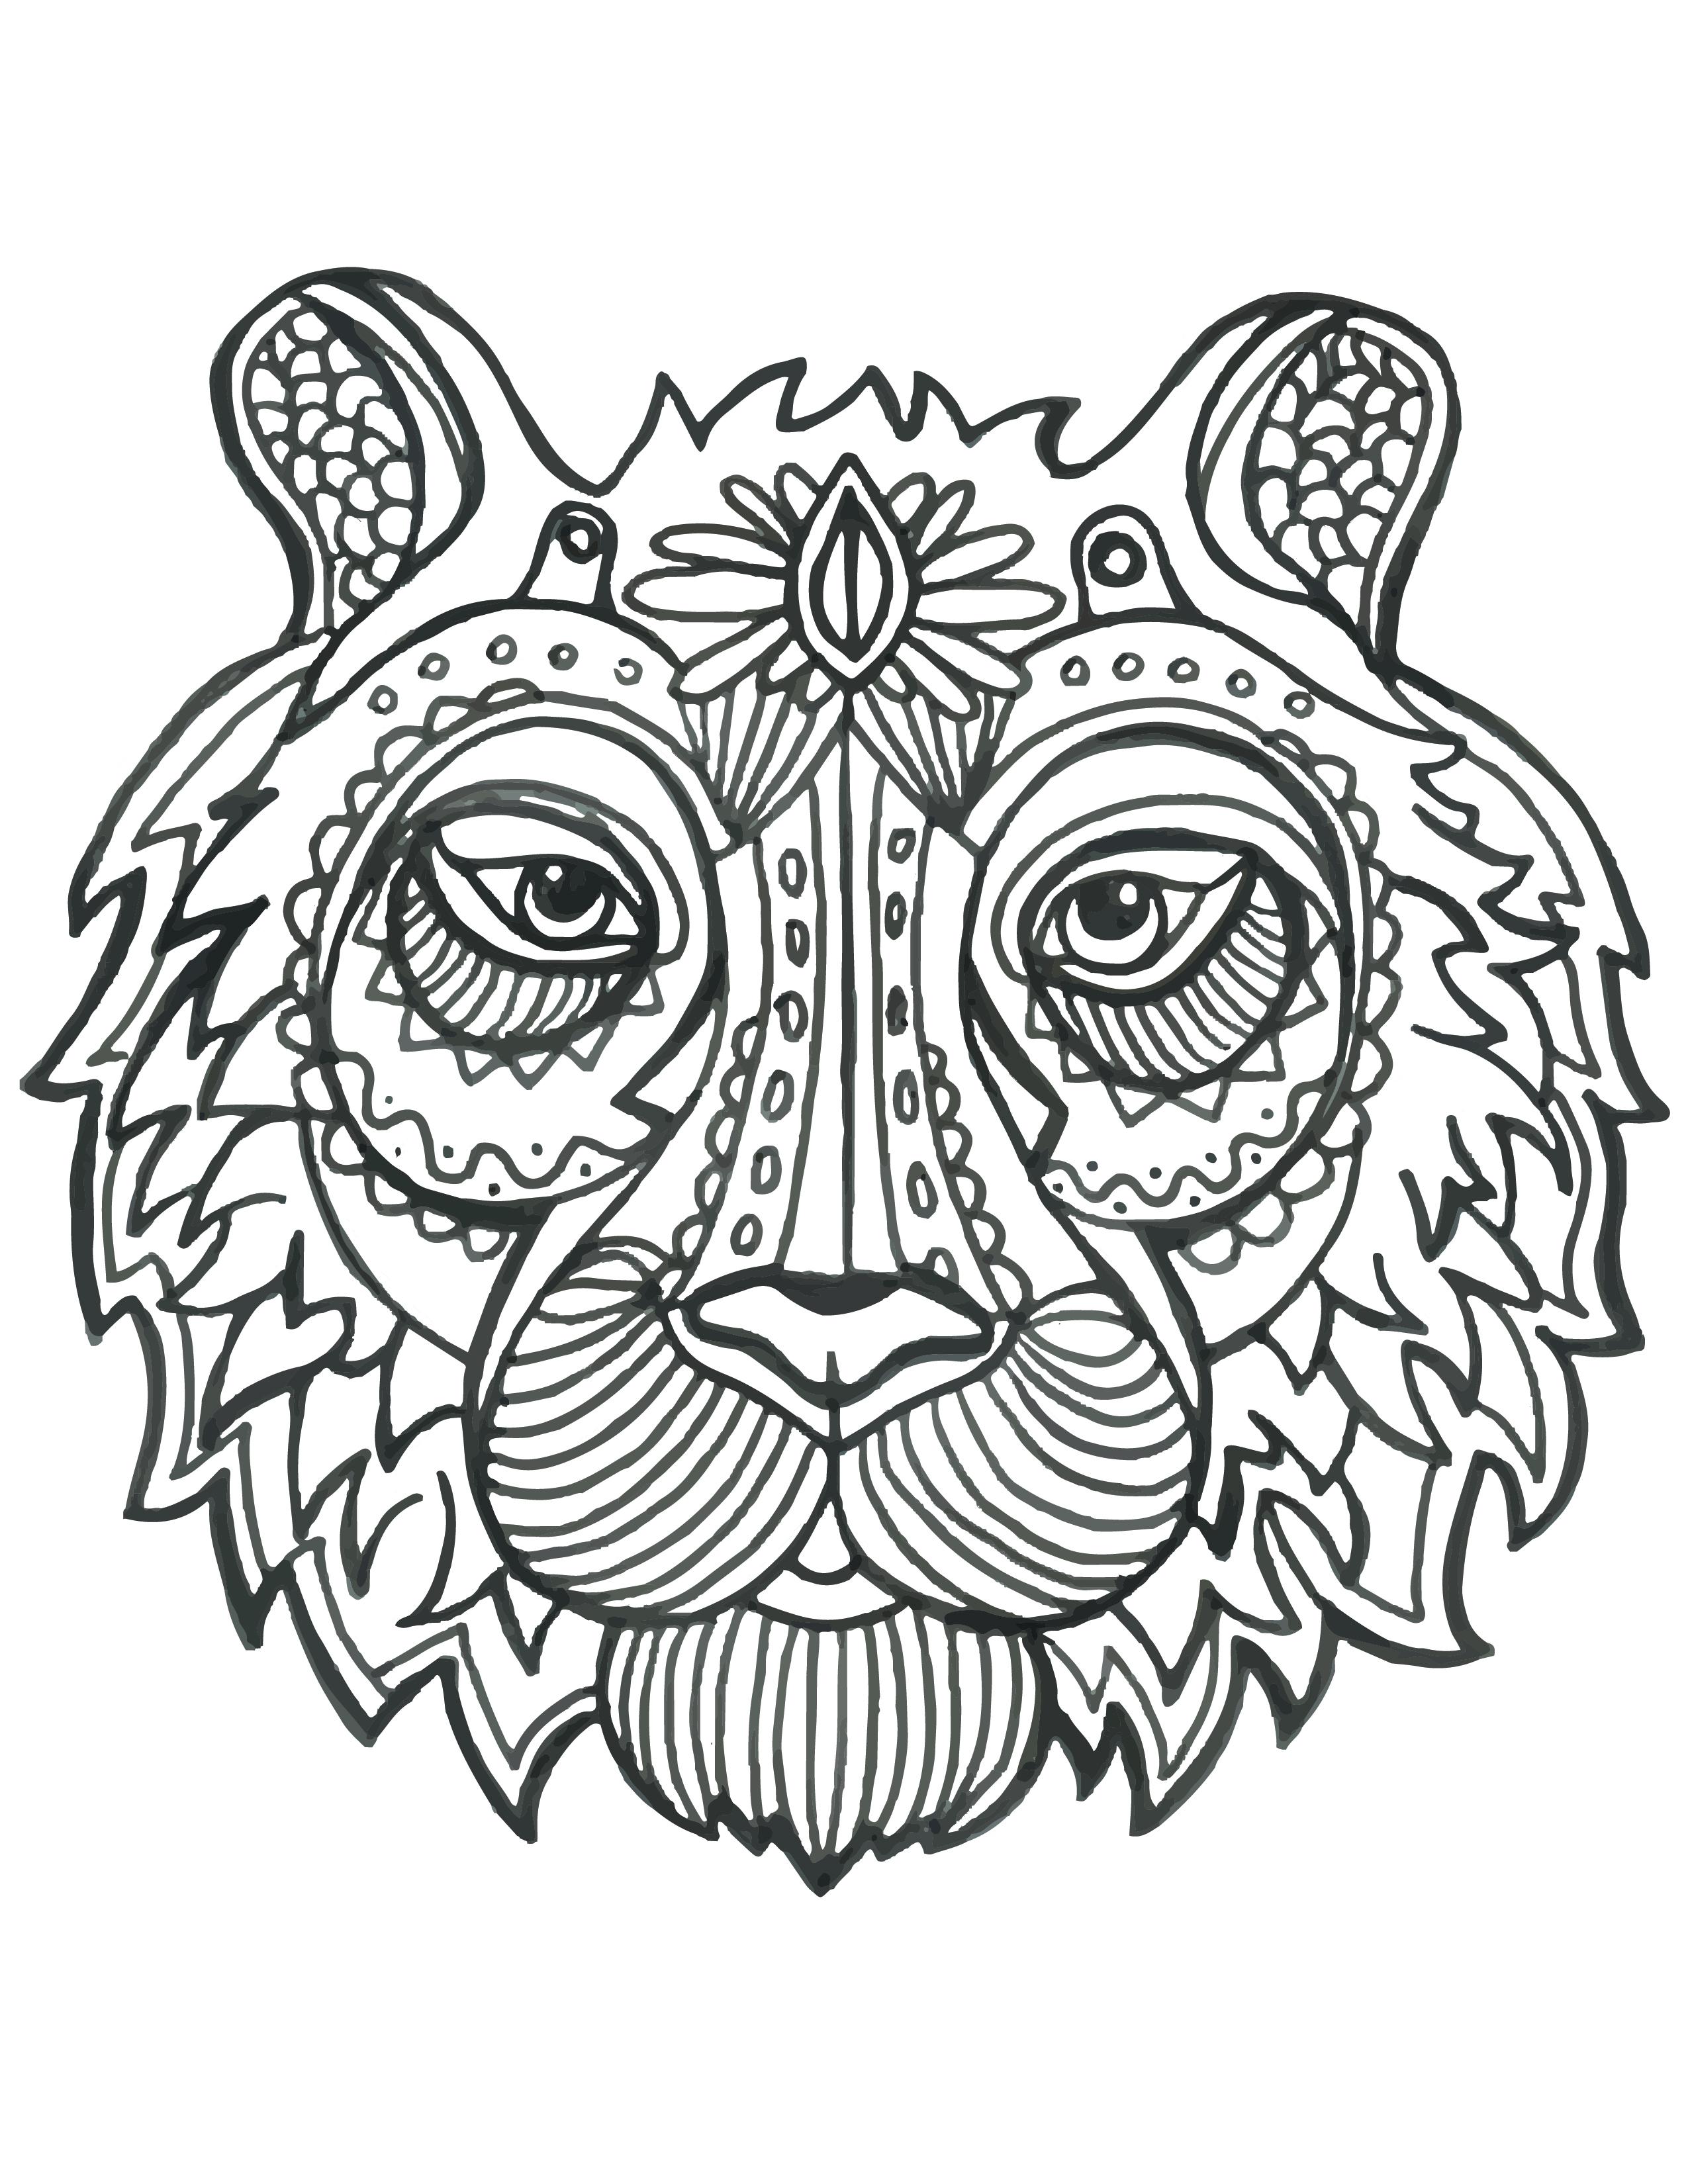 Inspiration tete animaux coloriage mandalas - Mandalas animaux ...